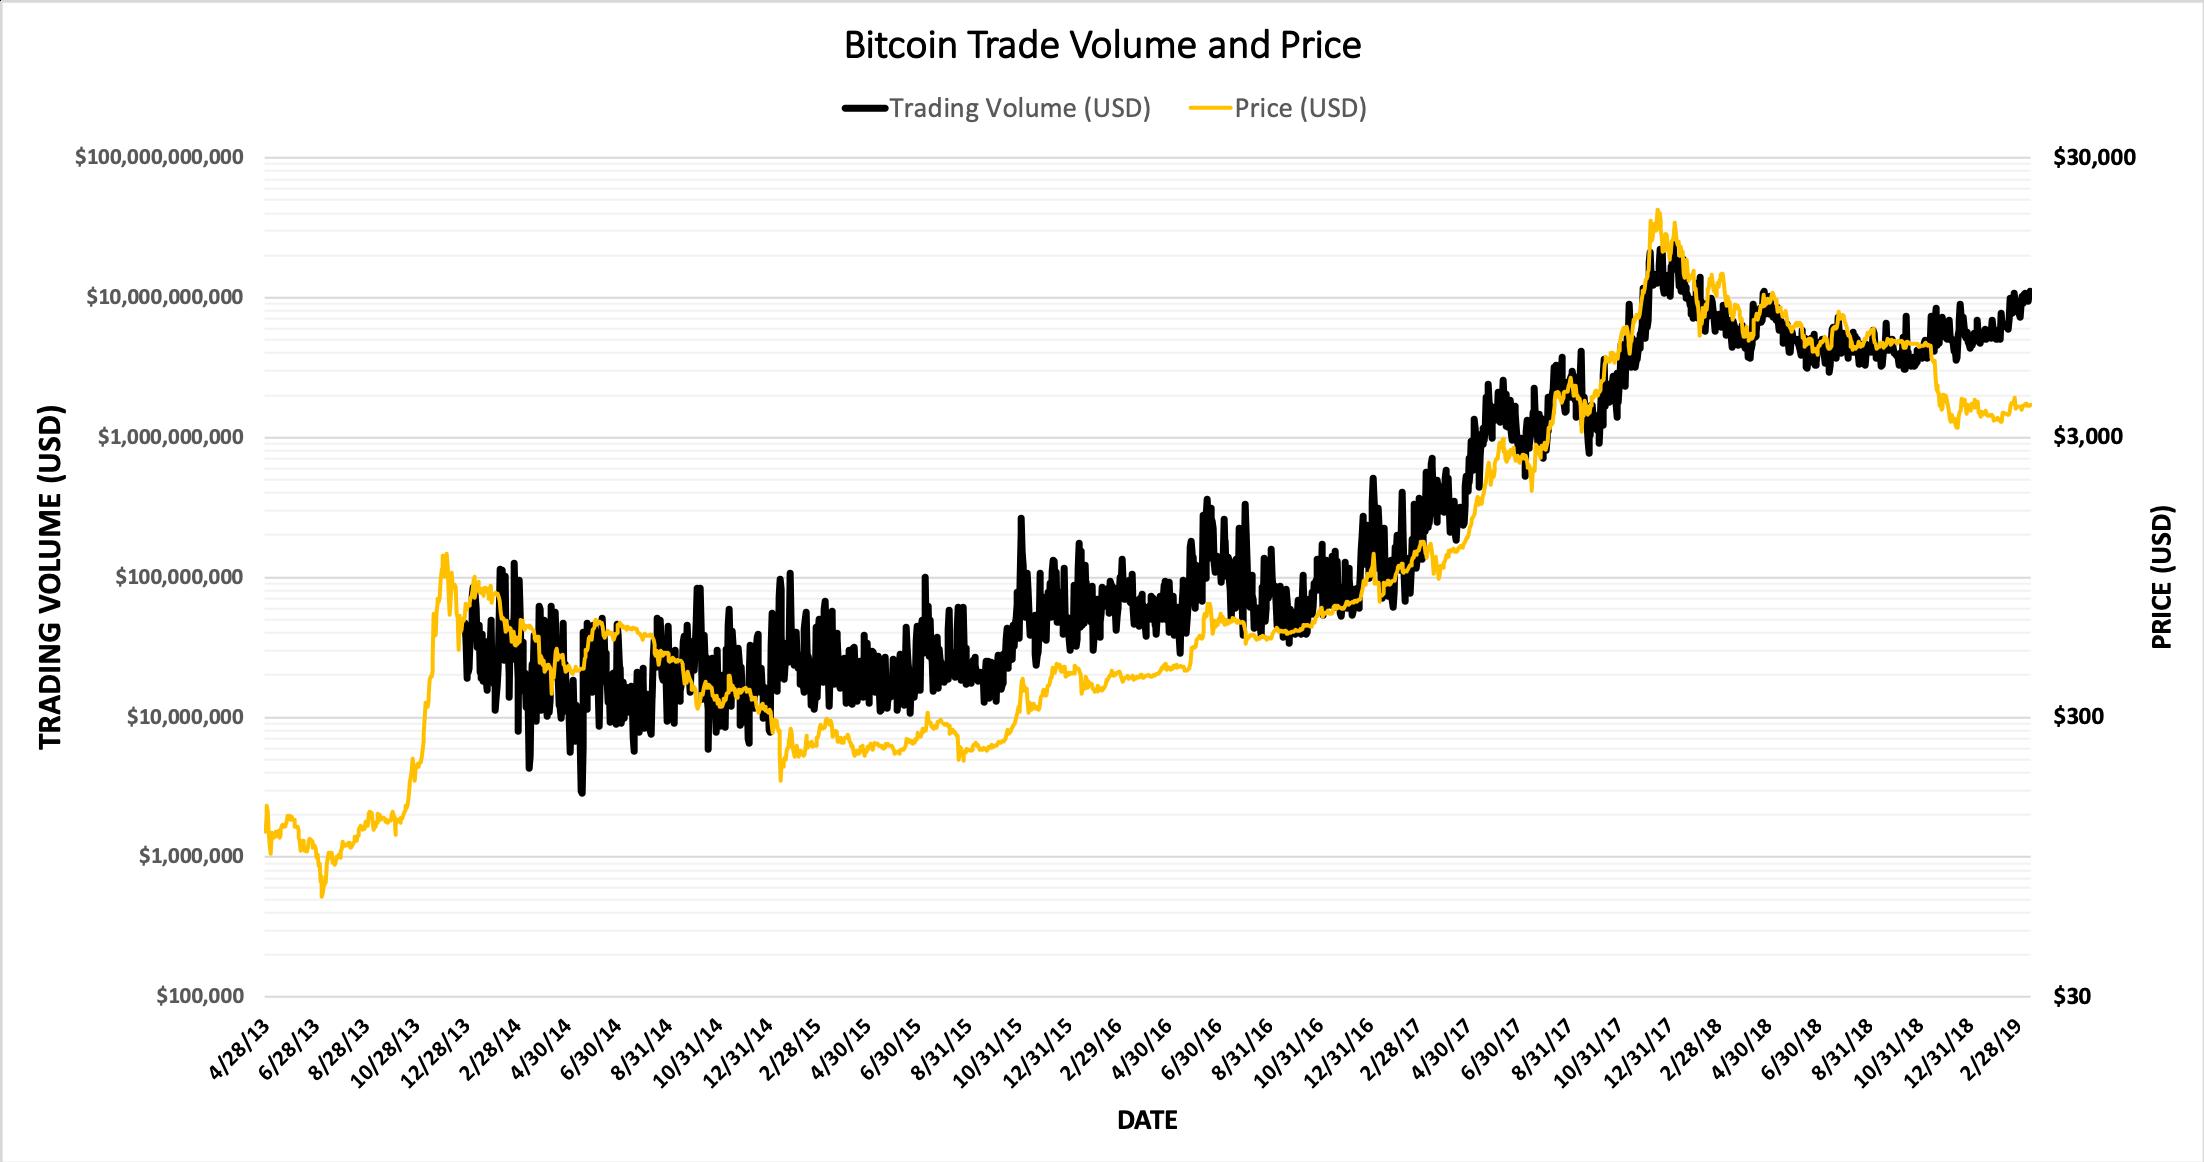 Bitcoin Ticaret Hacmi